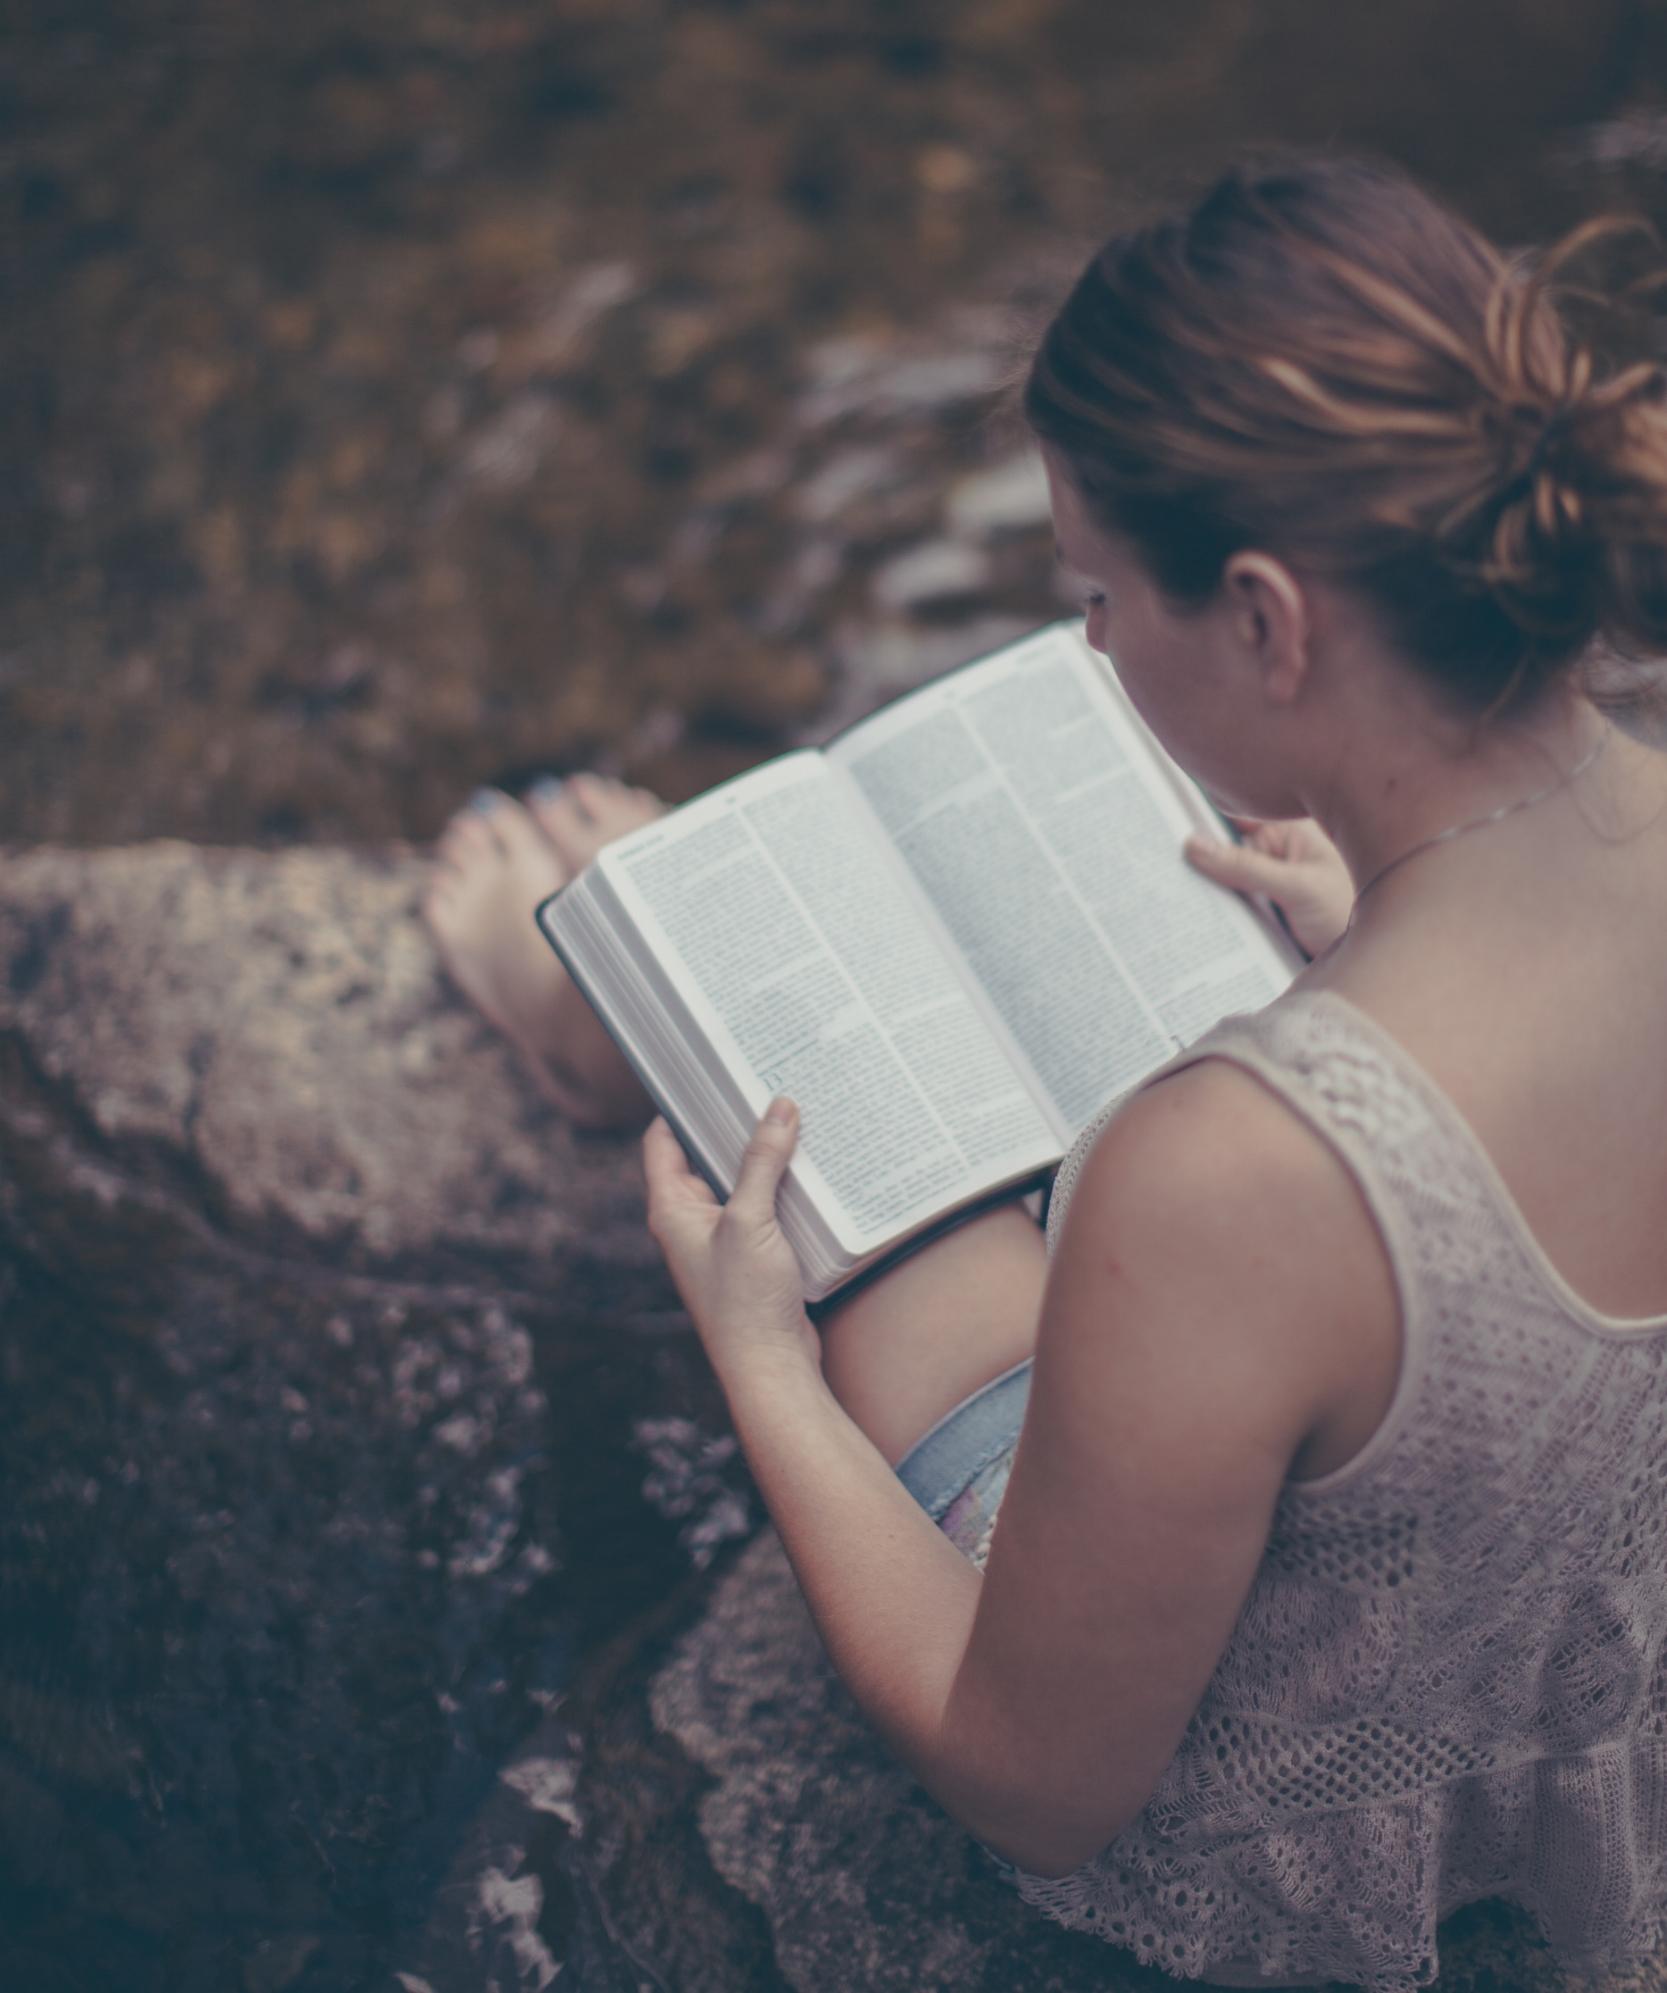 Woman Reading Bible.jpg